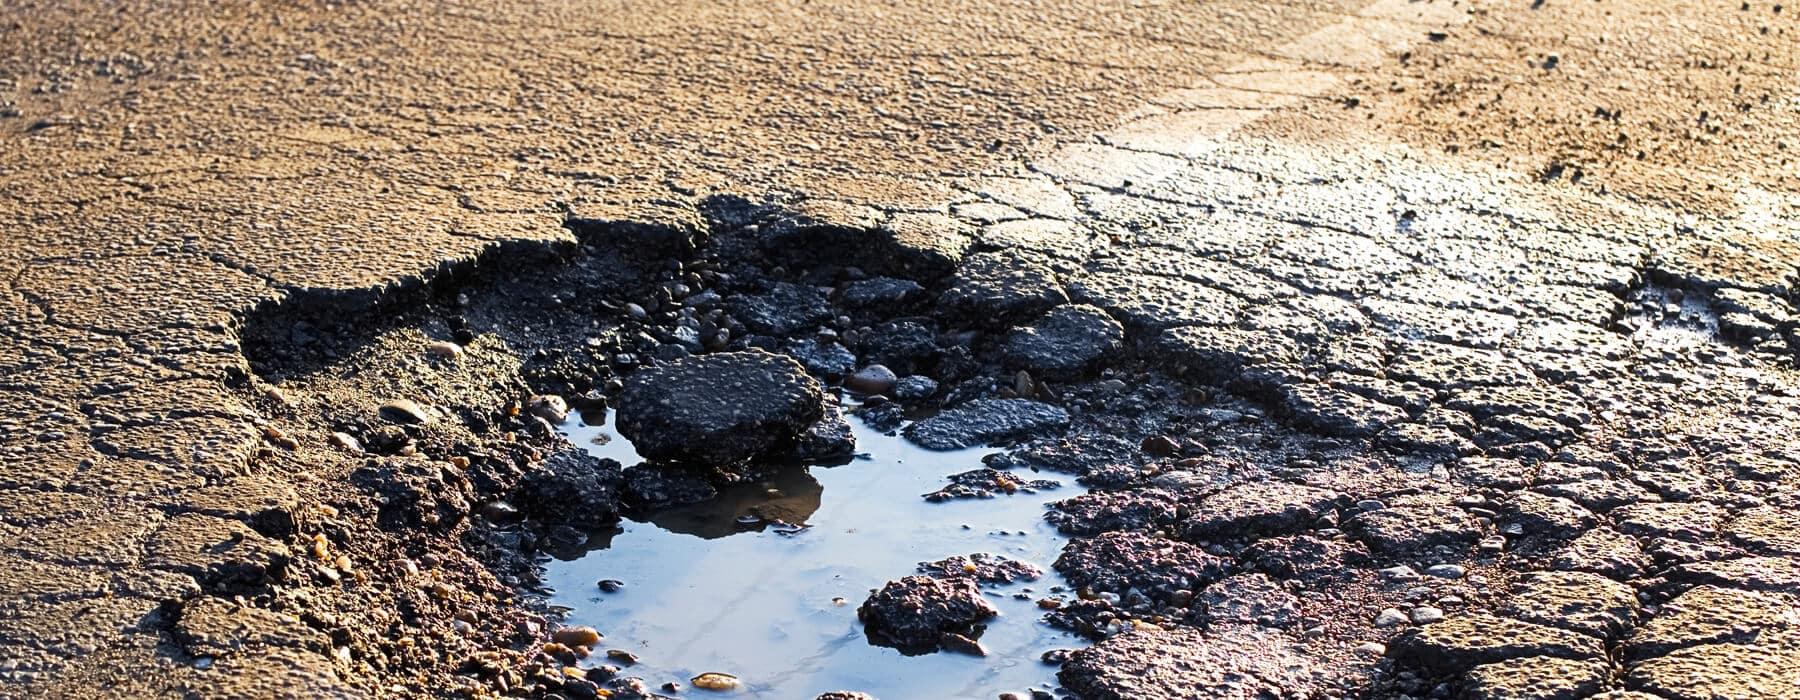 Vern Eide Honda Potholes Slider